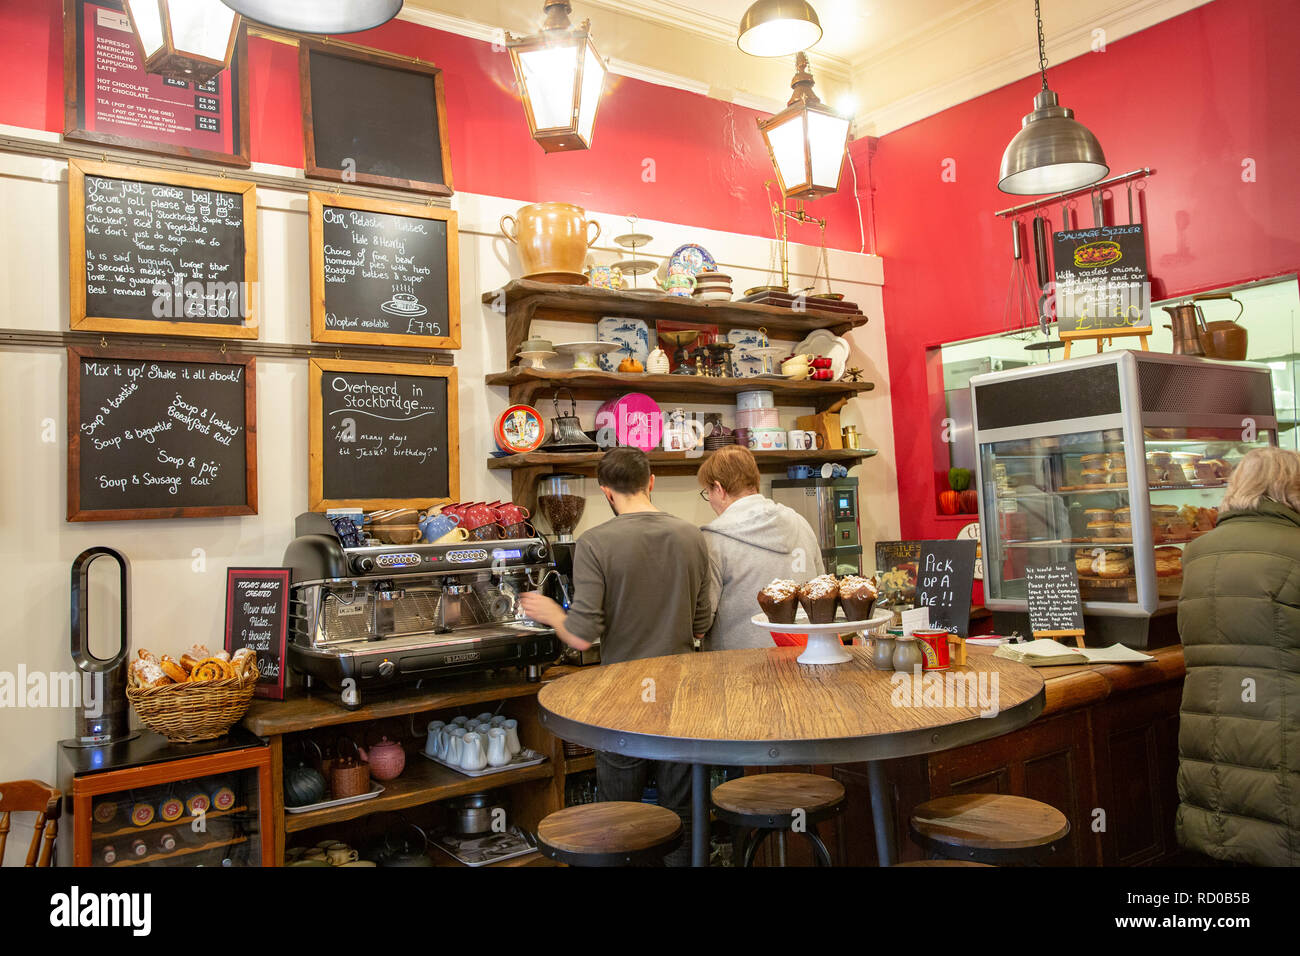 Interior Of A Cafe Coffee Shop In Stockbridgeedinburgh